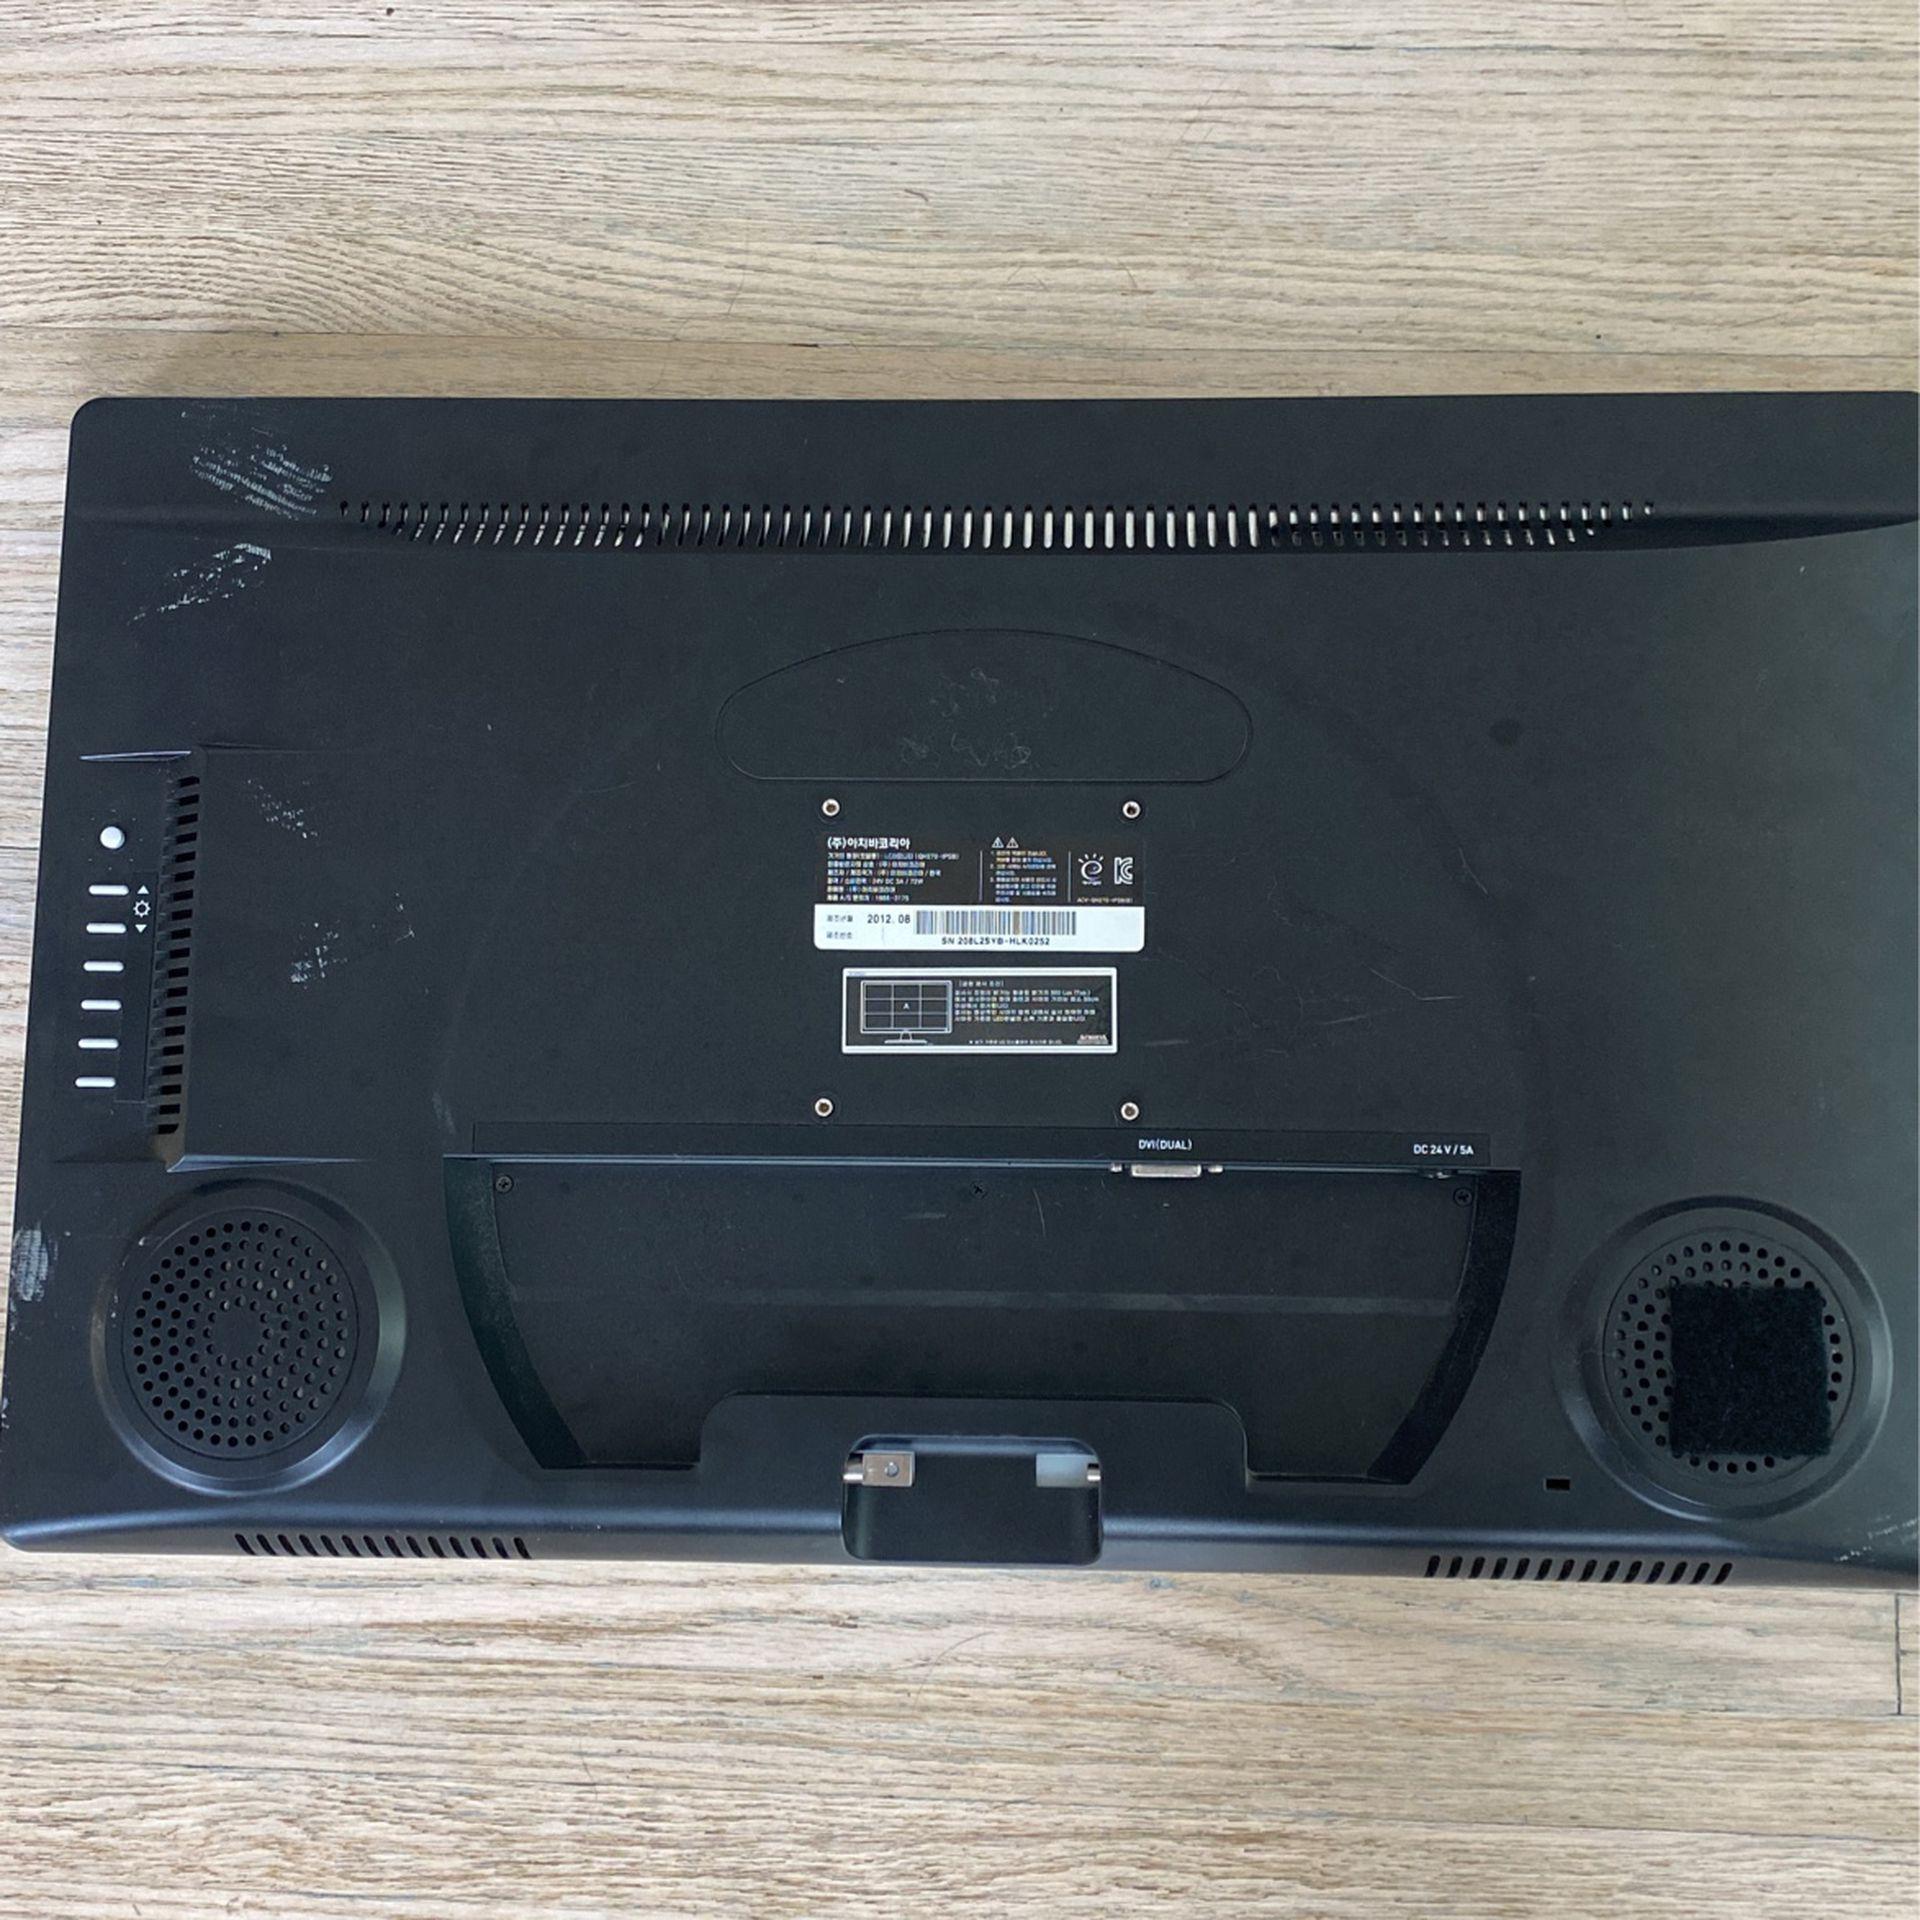 Shimian QH270 IPS Monitor 1440p